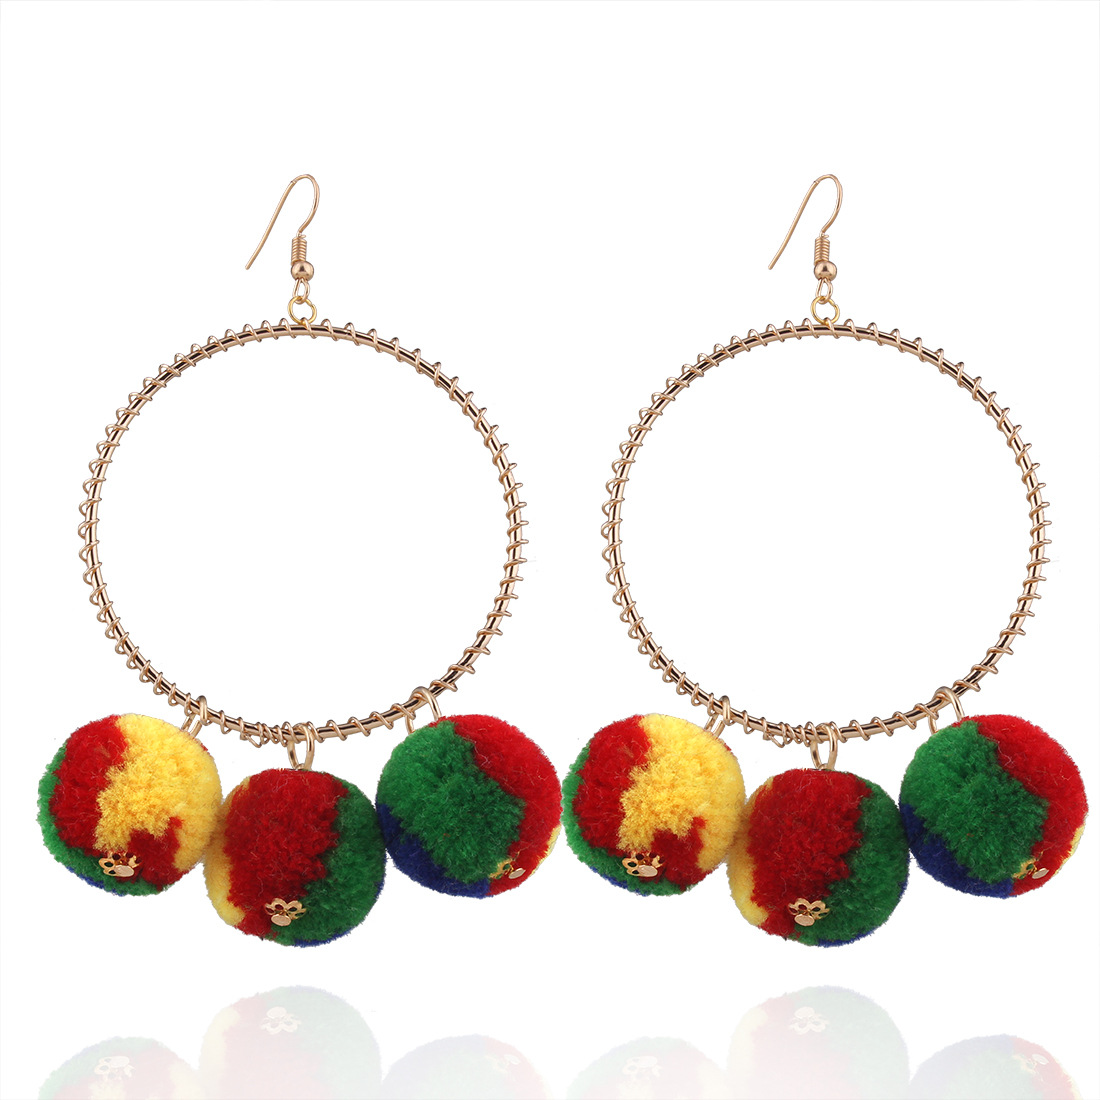 K's Gadgets Bohemian Big Earrings Drop Earrings Faux Fur Plush Ball Long  Pin Dangle Earrings For